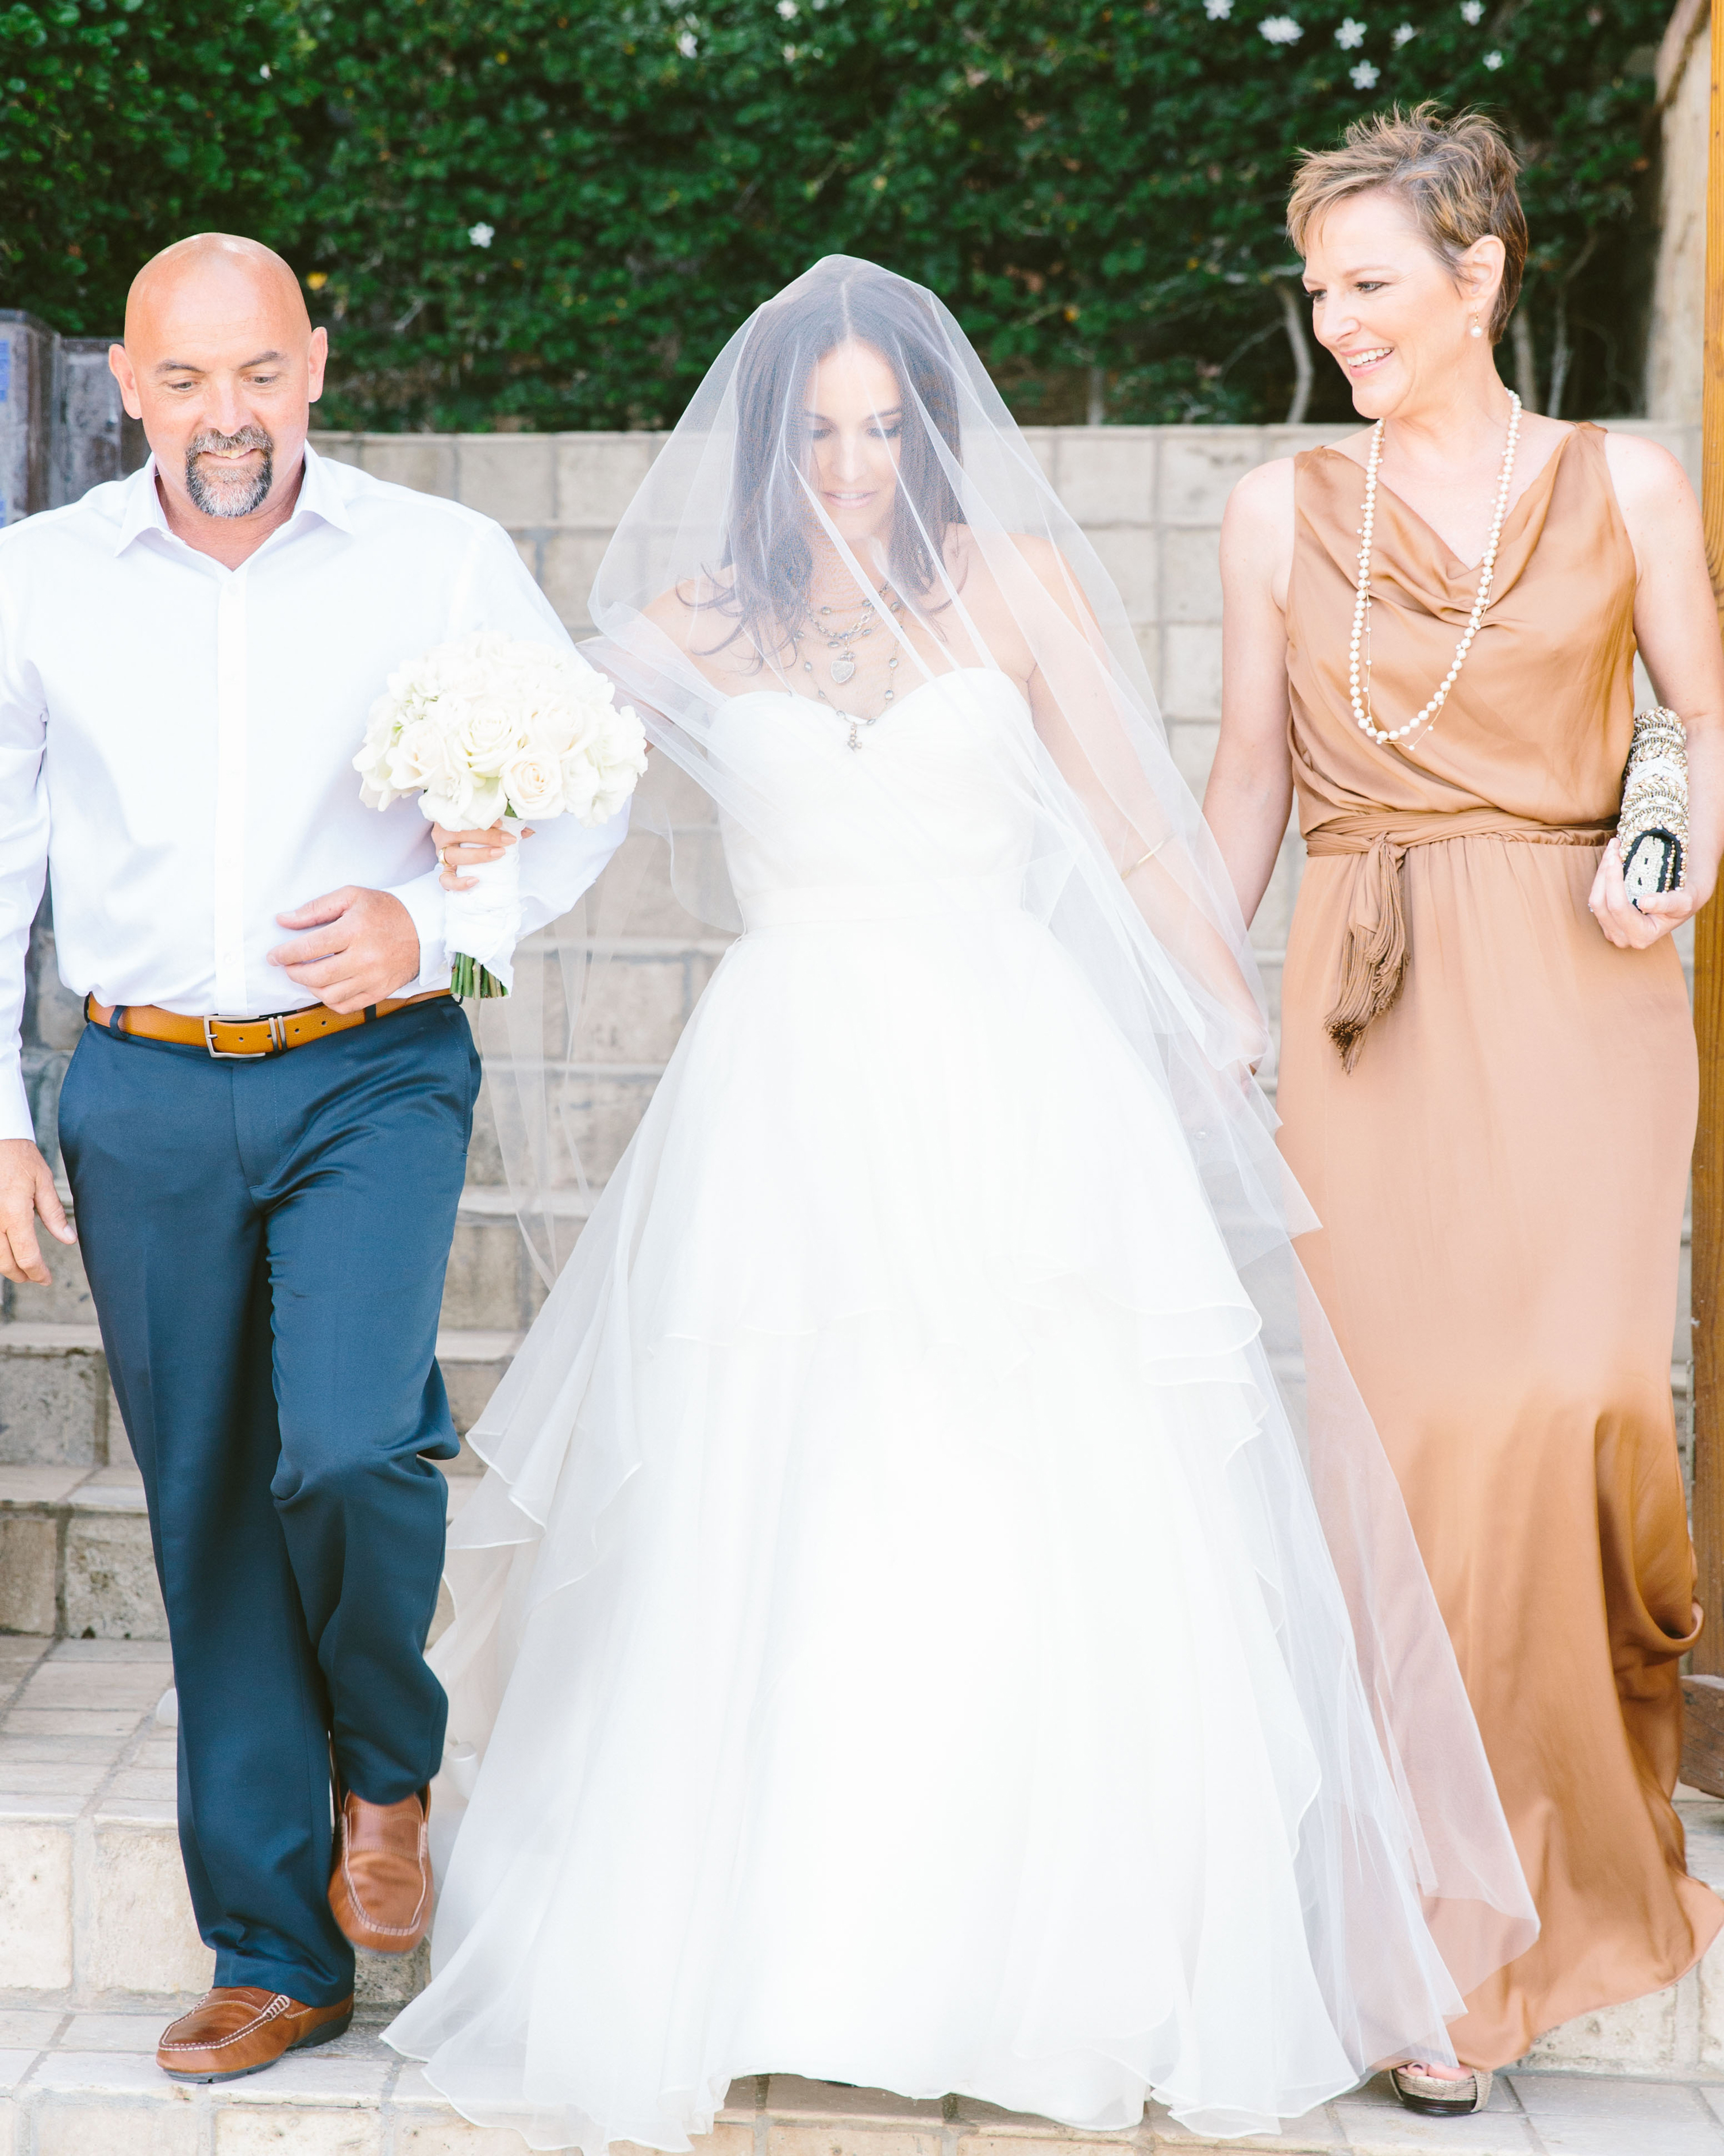 ali-jess-wedding-parents-053-002-s111717-1214.jpg